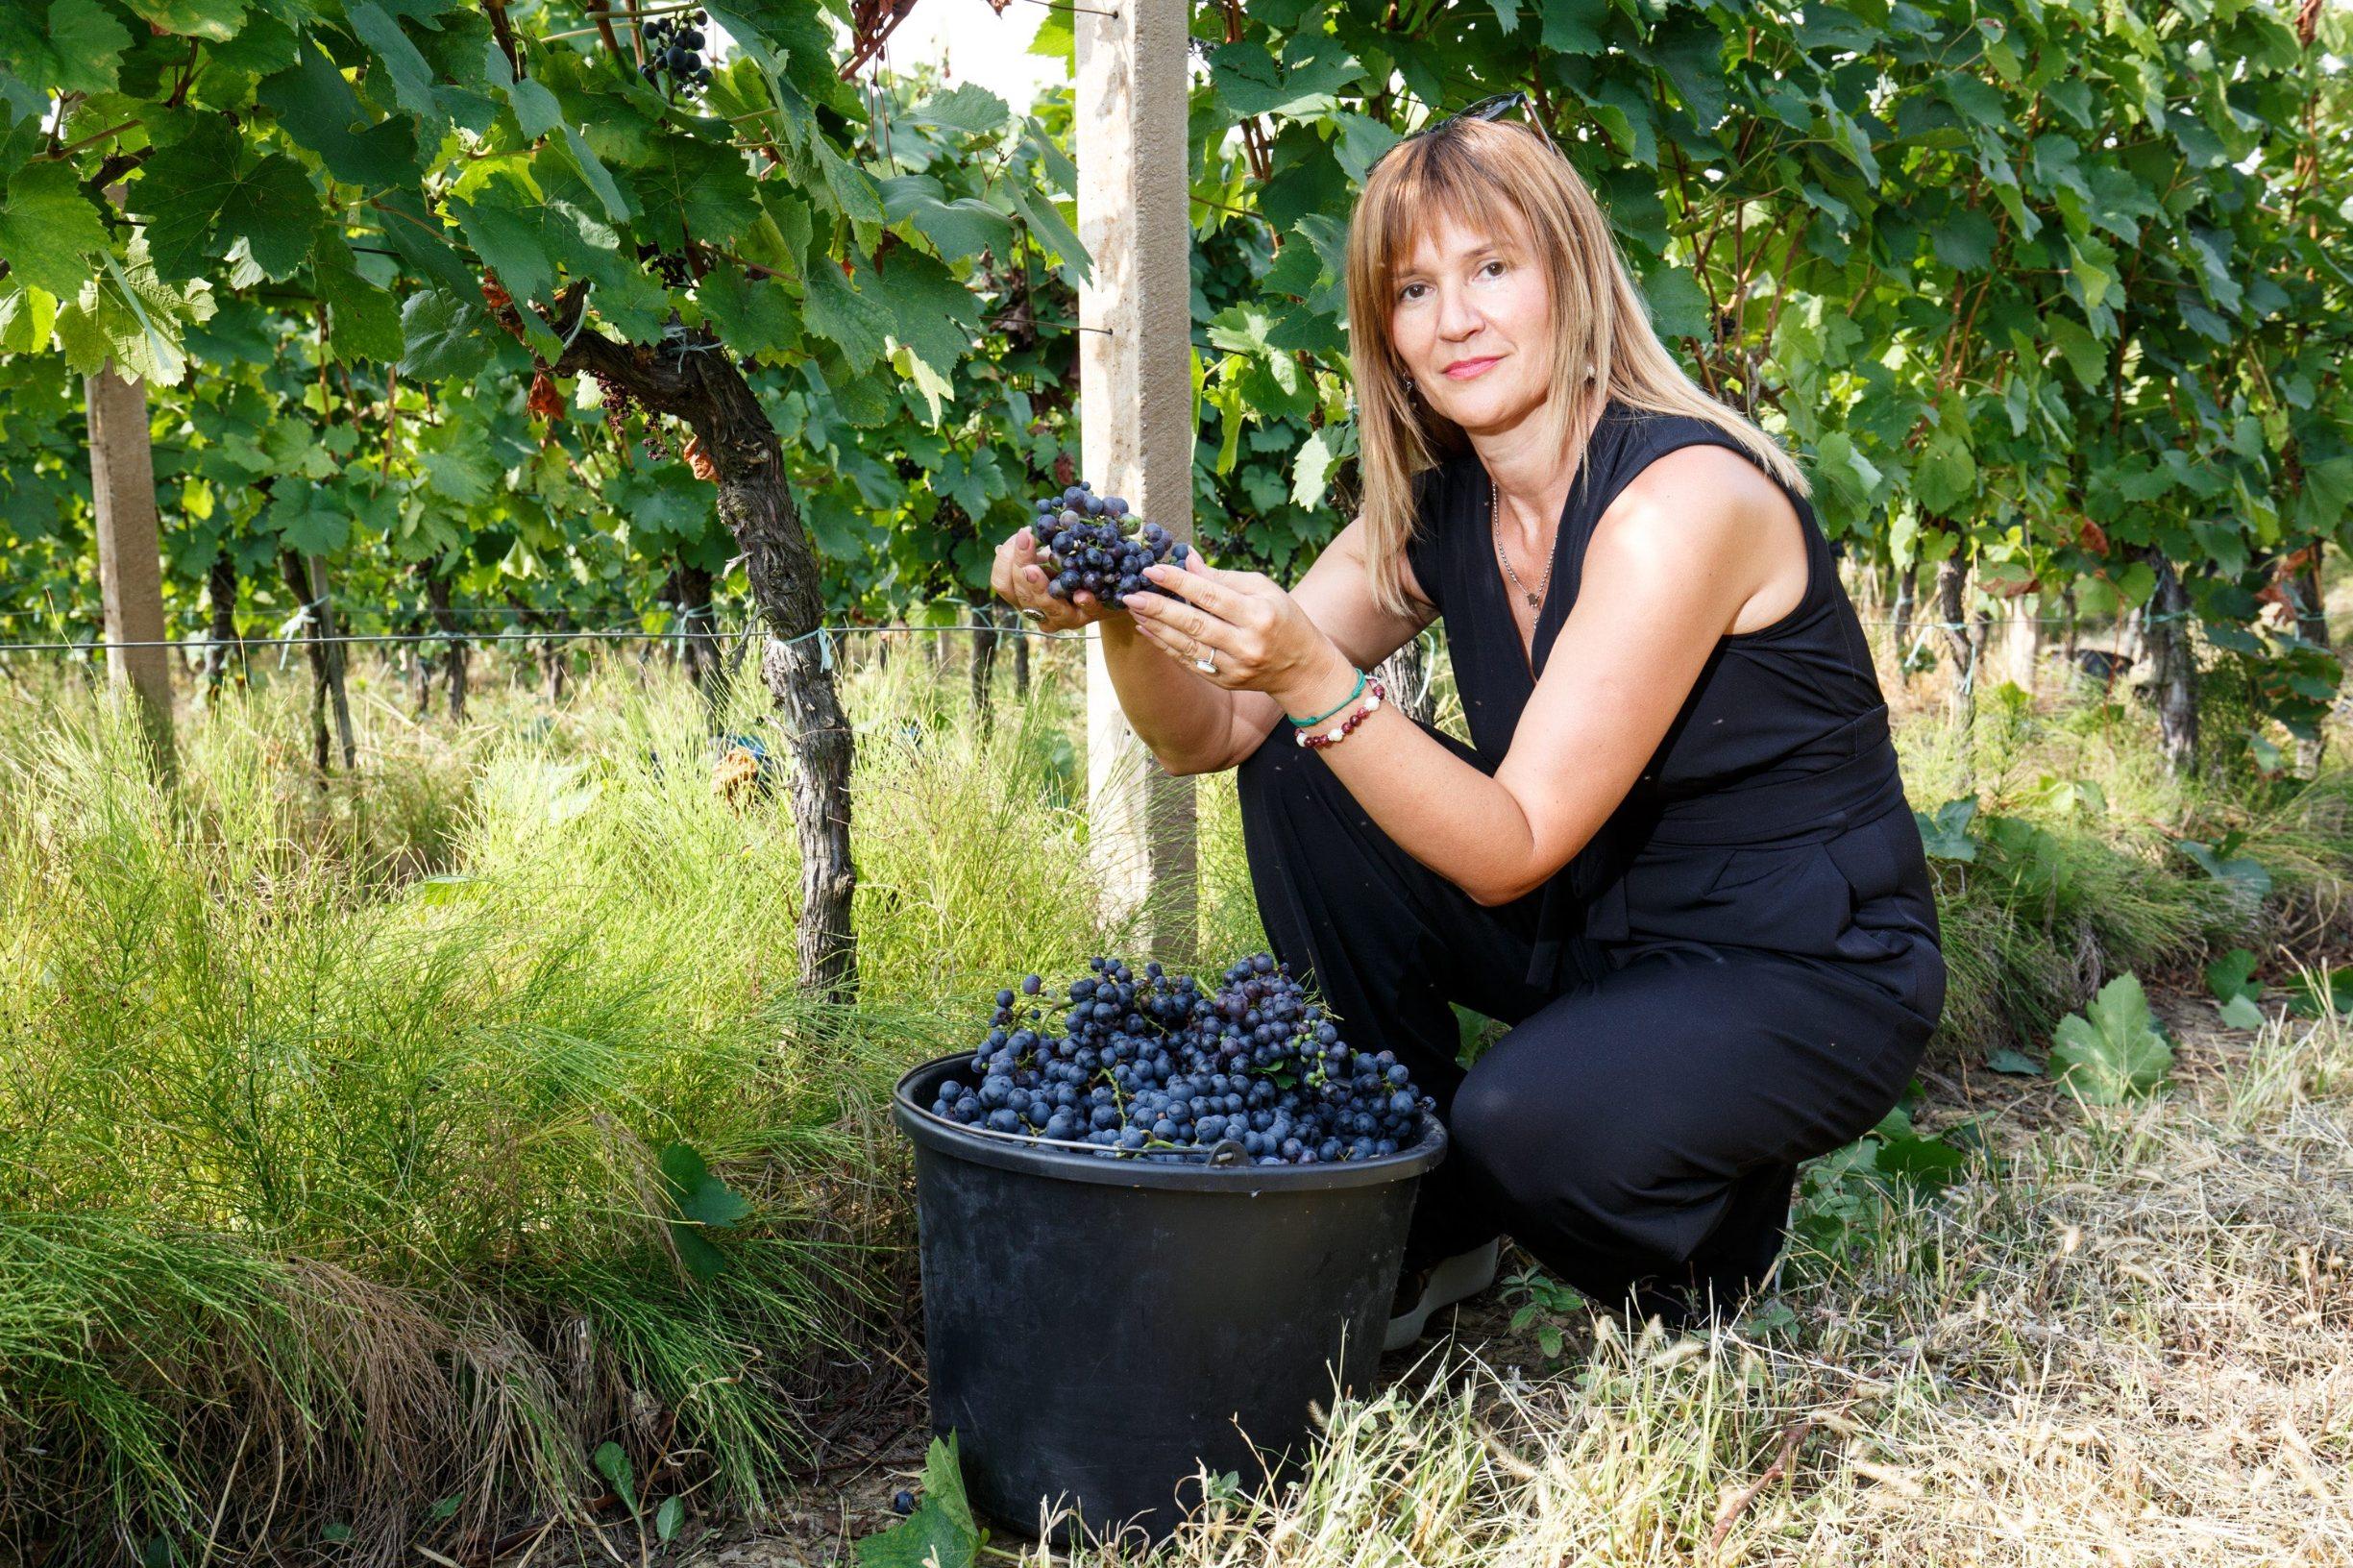 Fericanci, 290819. Reportaza s berbe grozdja u vinogradima Feravina. Na fotografiji: Janette Simic voditeljica marketinga. Foto: Vlado Kos / CROPIX